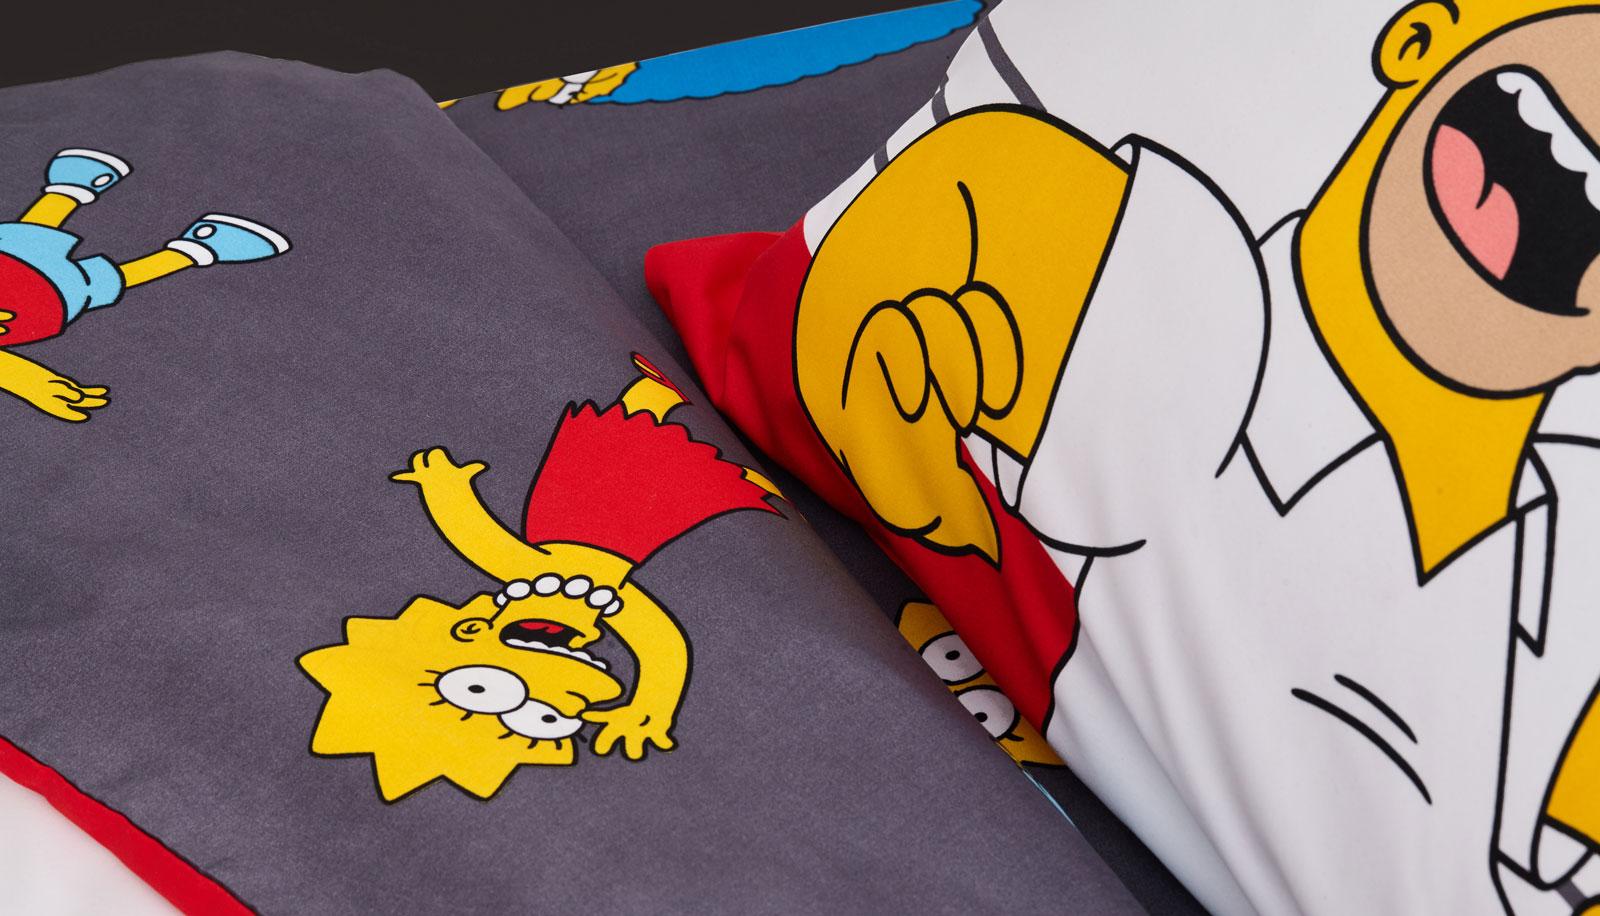 Lotus รุ่น Pop-art The Simpsons ชุดผ้าปูที่นอน LI-SS-02 (3.5 ft.)